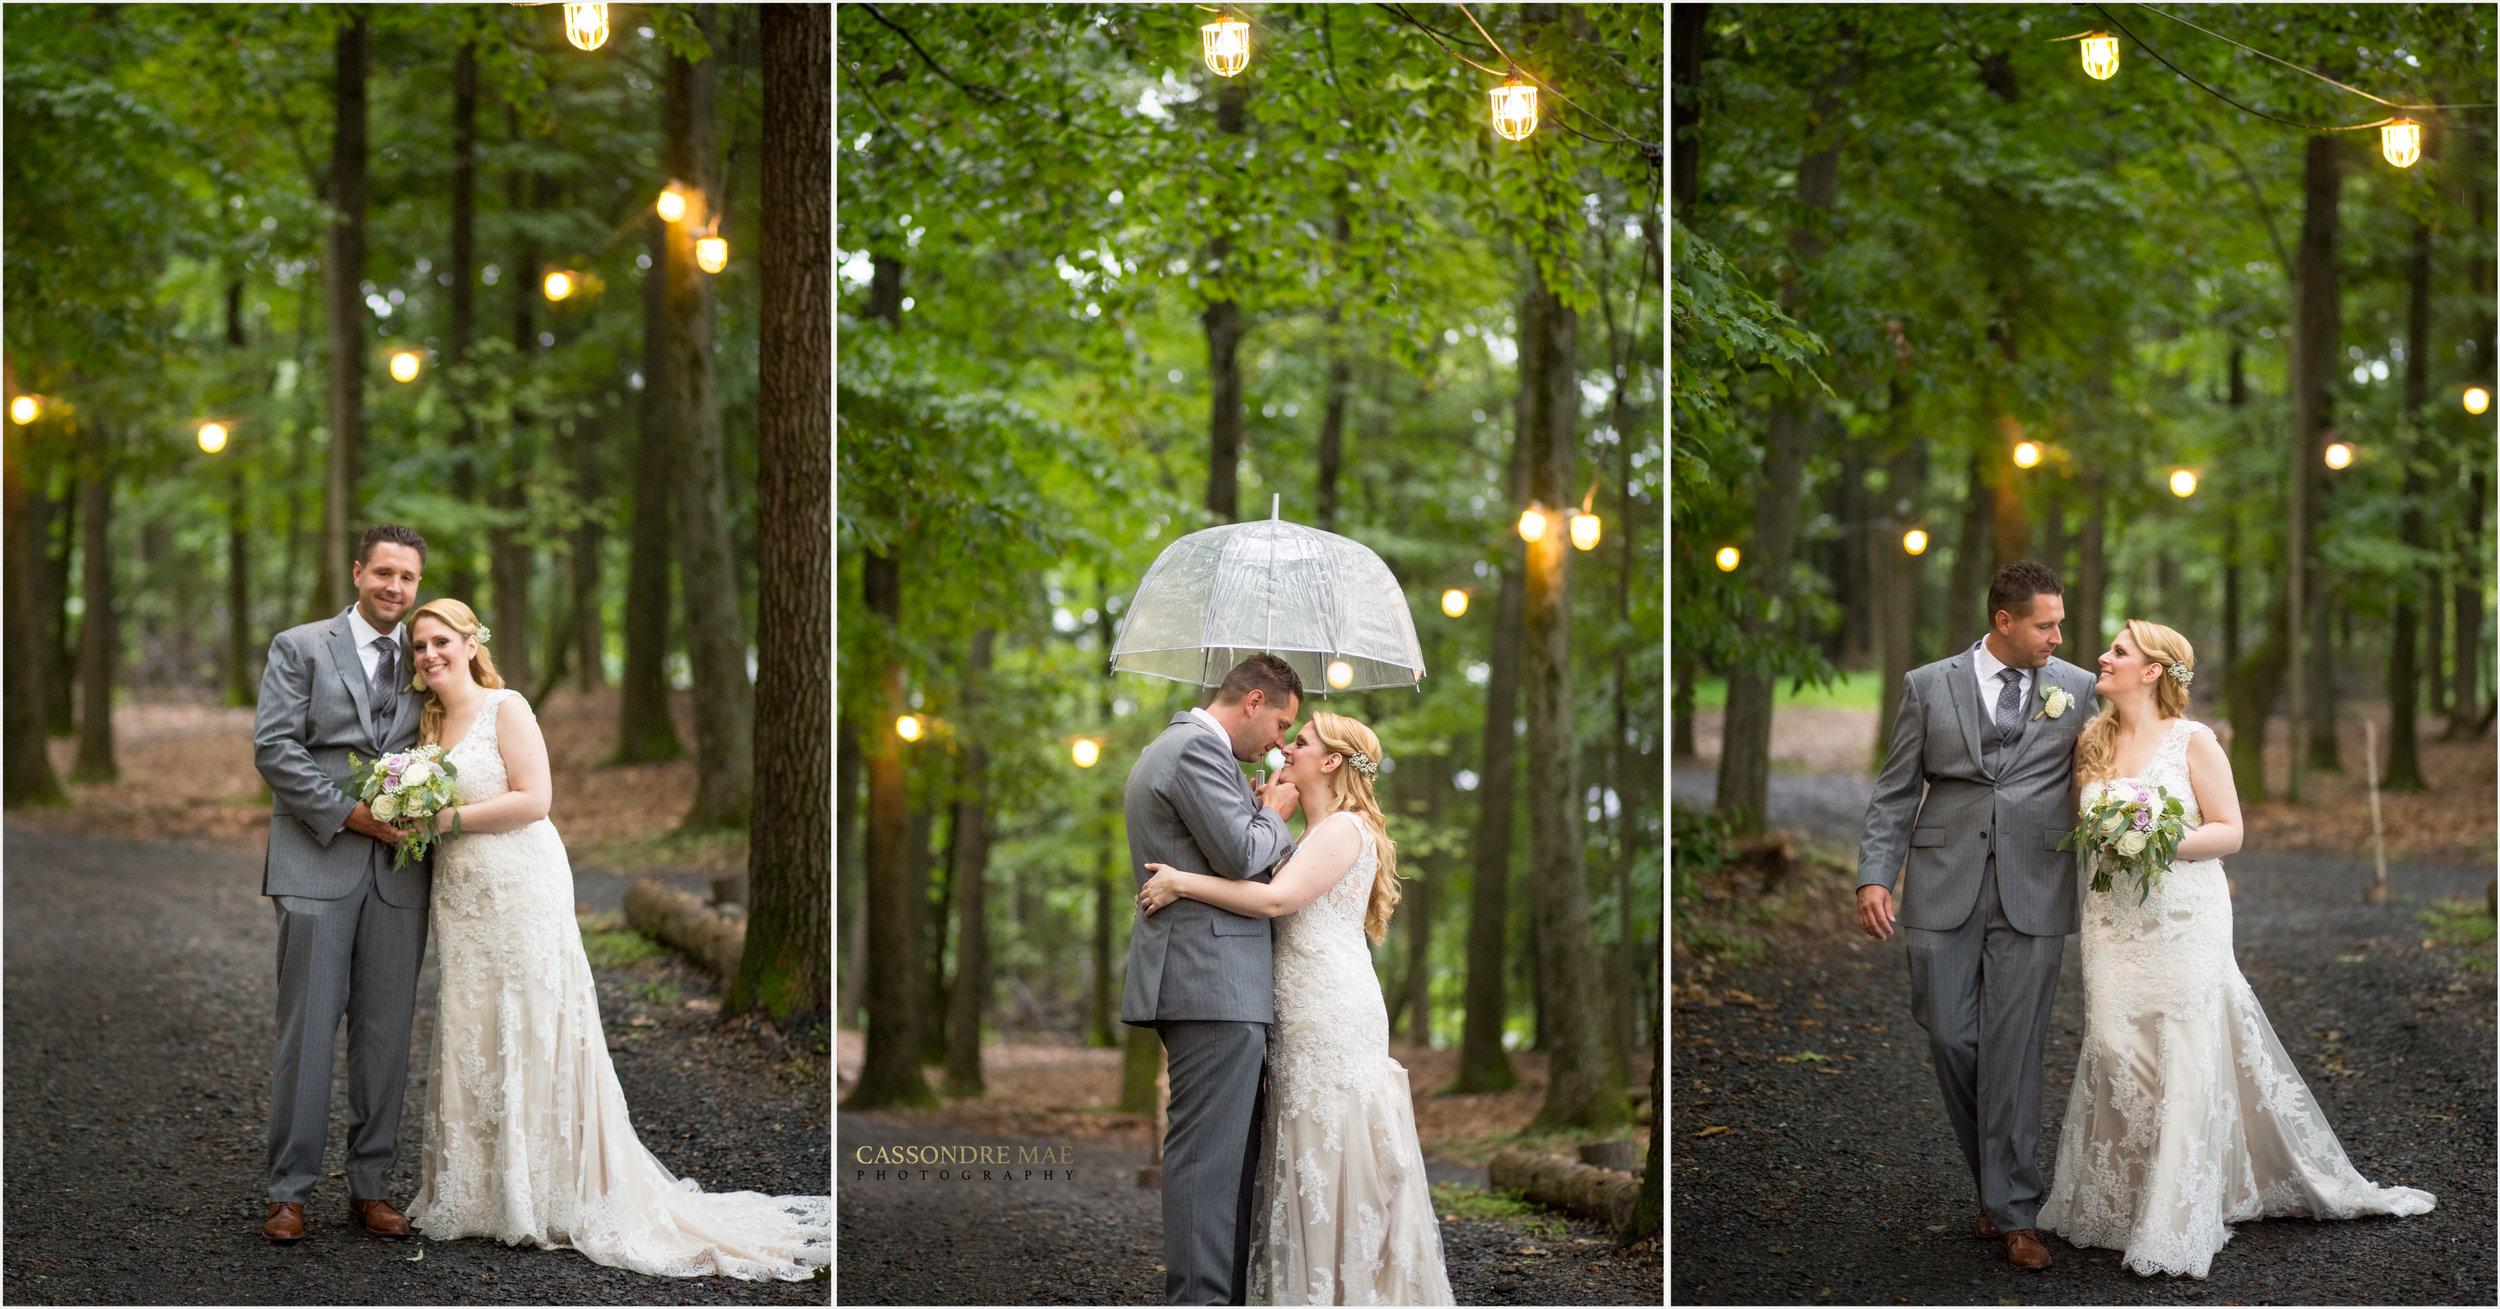 Cassondre Mae Photography Emmerich Tree Farm Wedding 31.jpg